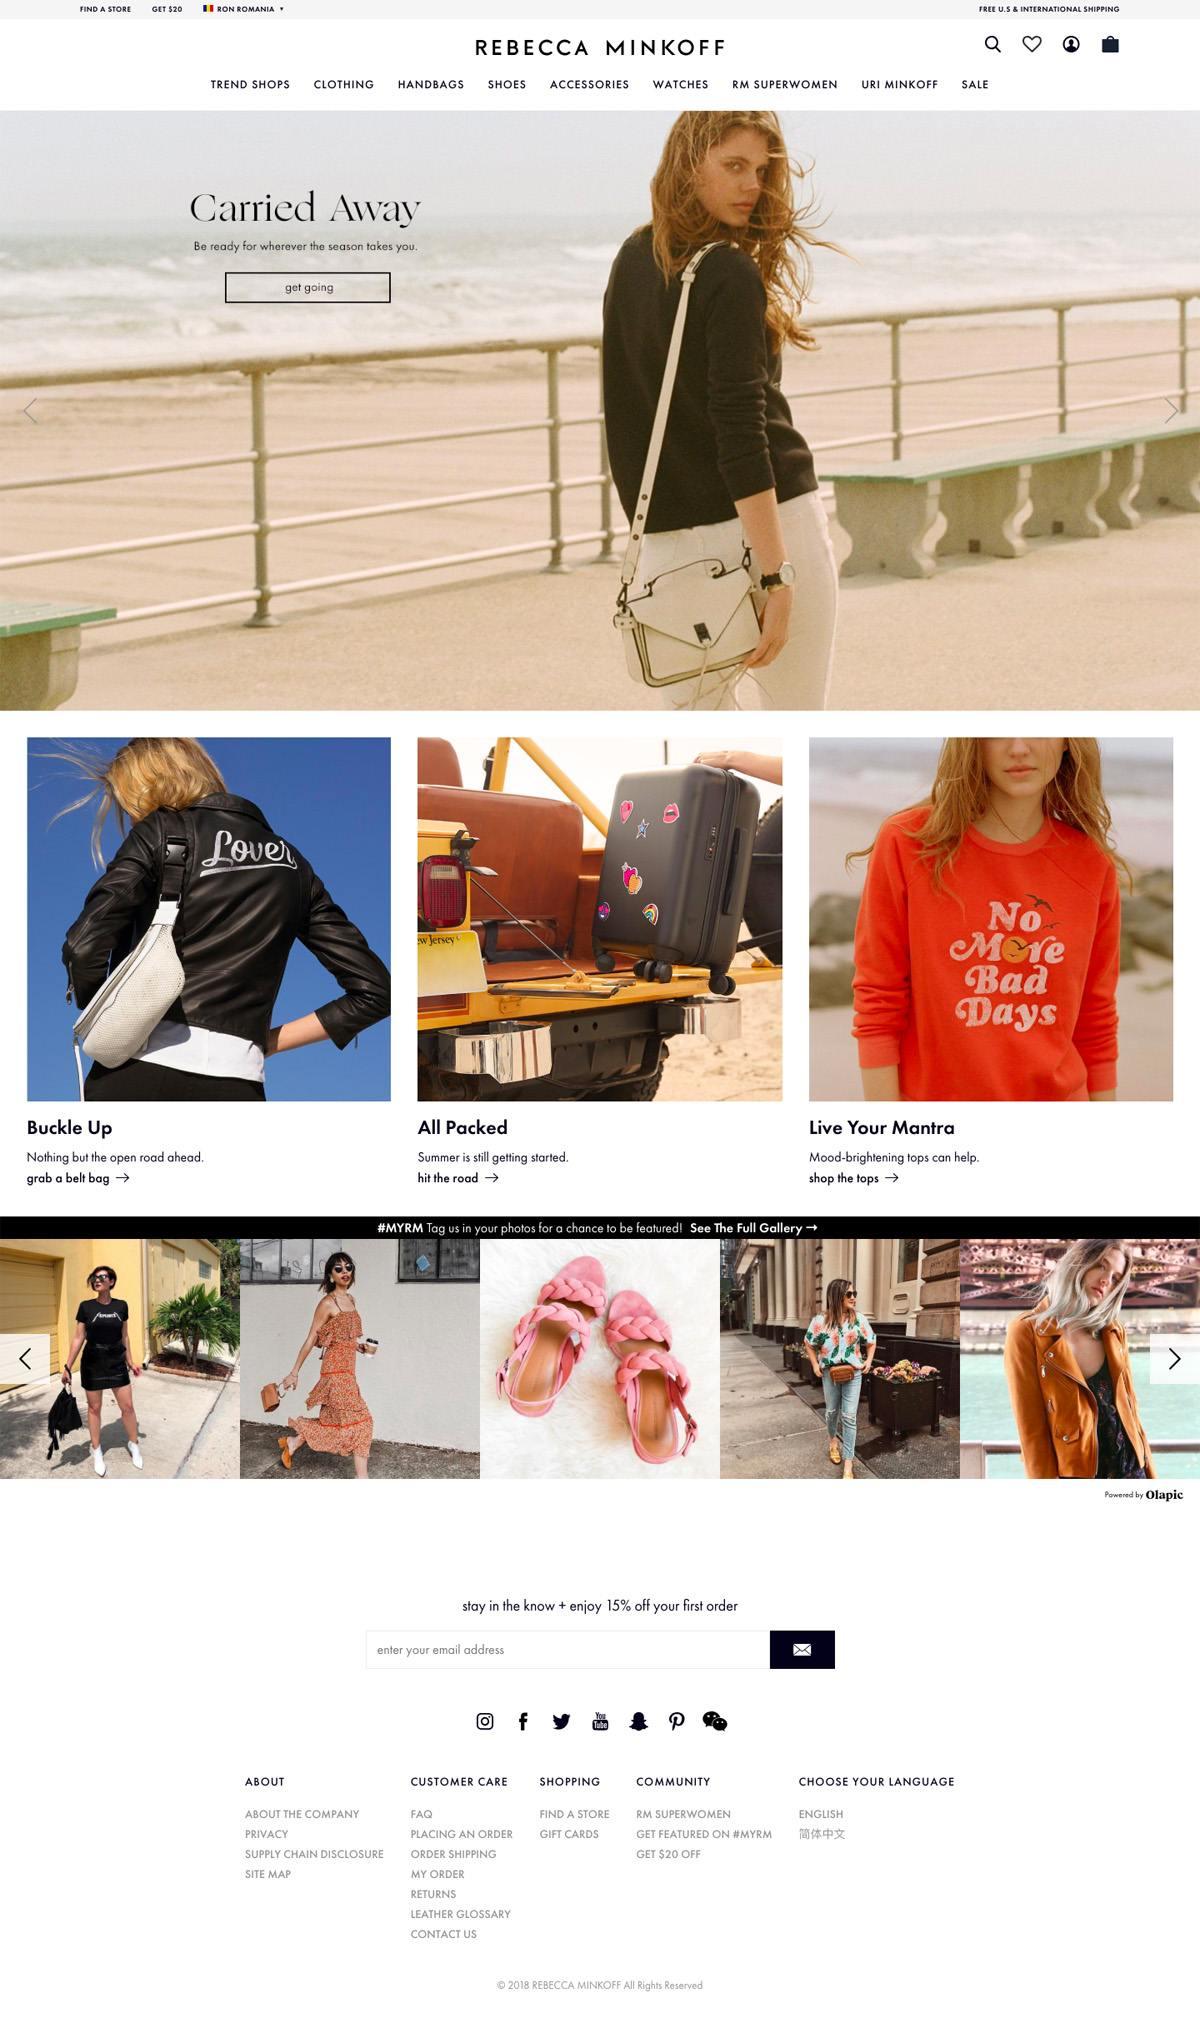 eCommerce website: Rebecca Minkoff